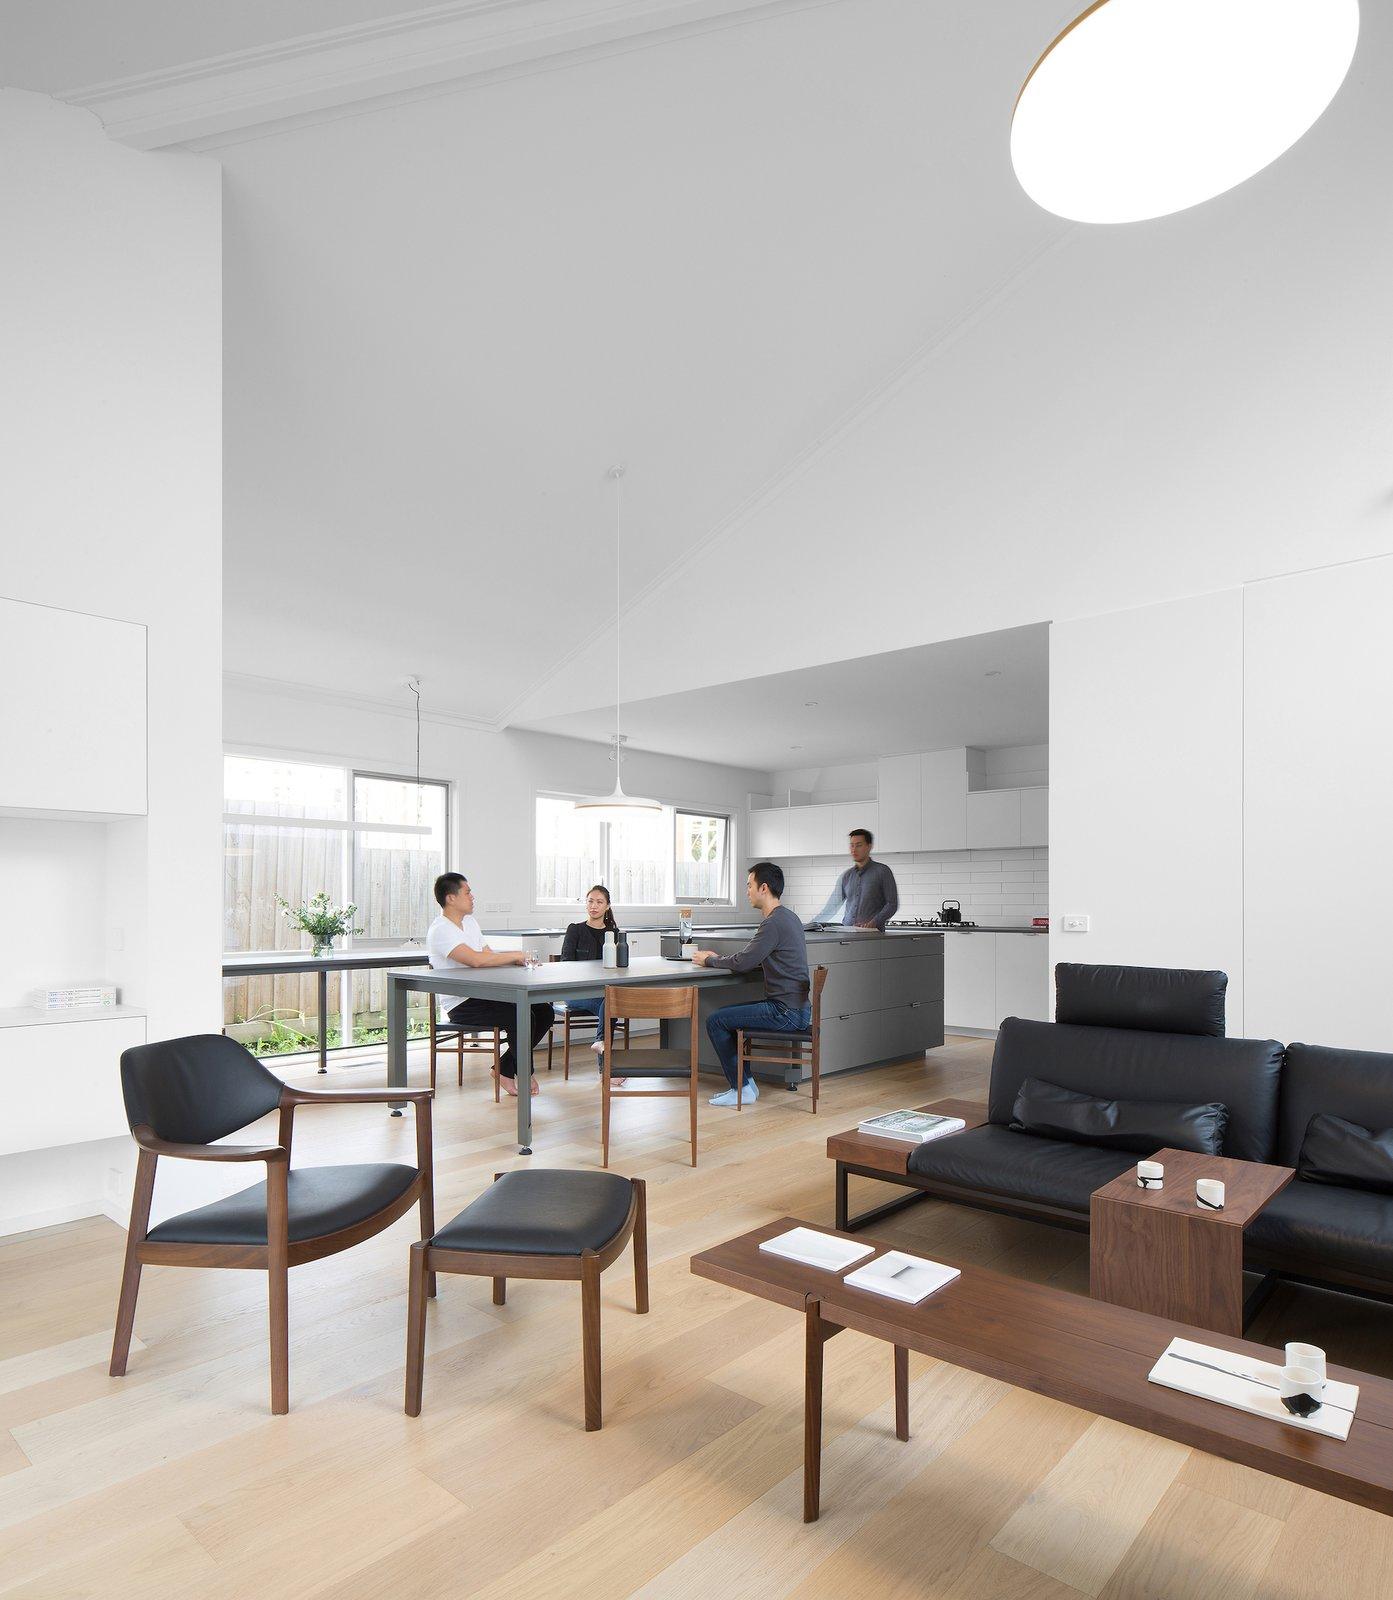 Corhampton Rd Residence by Leibal